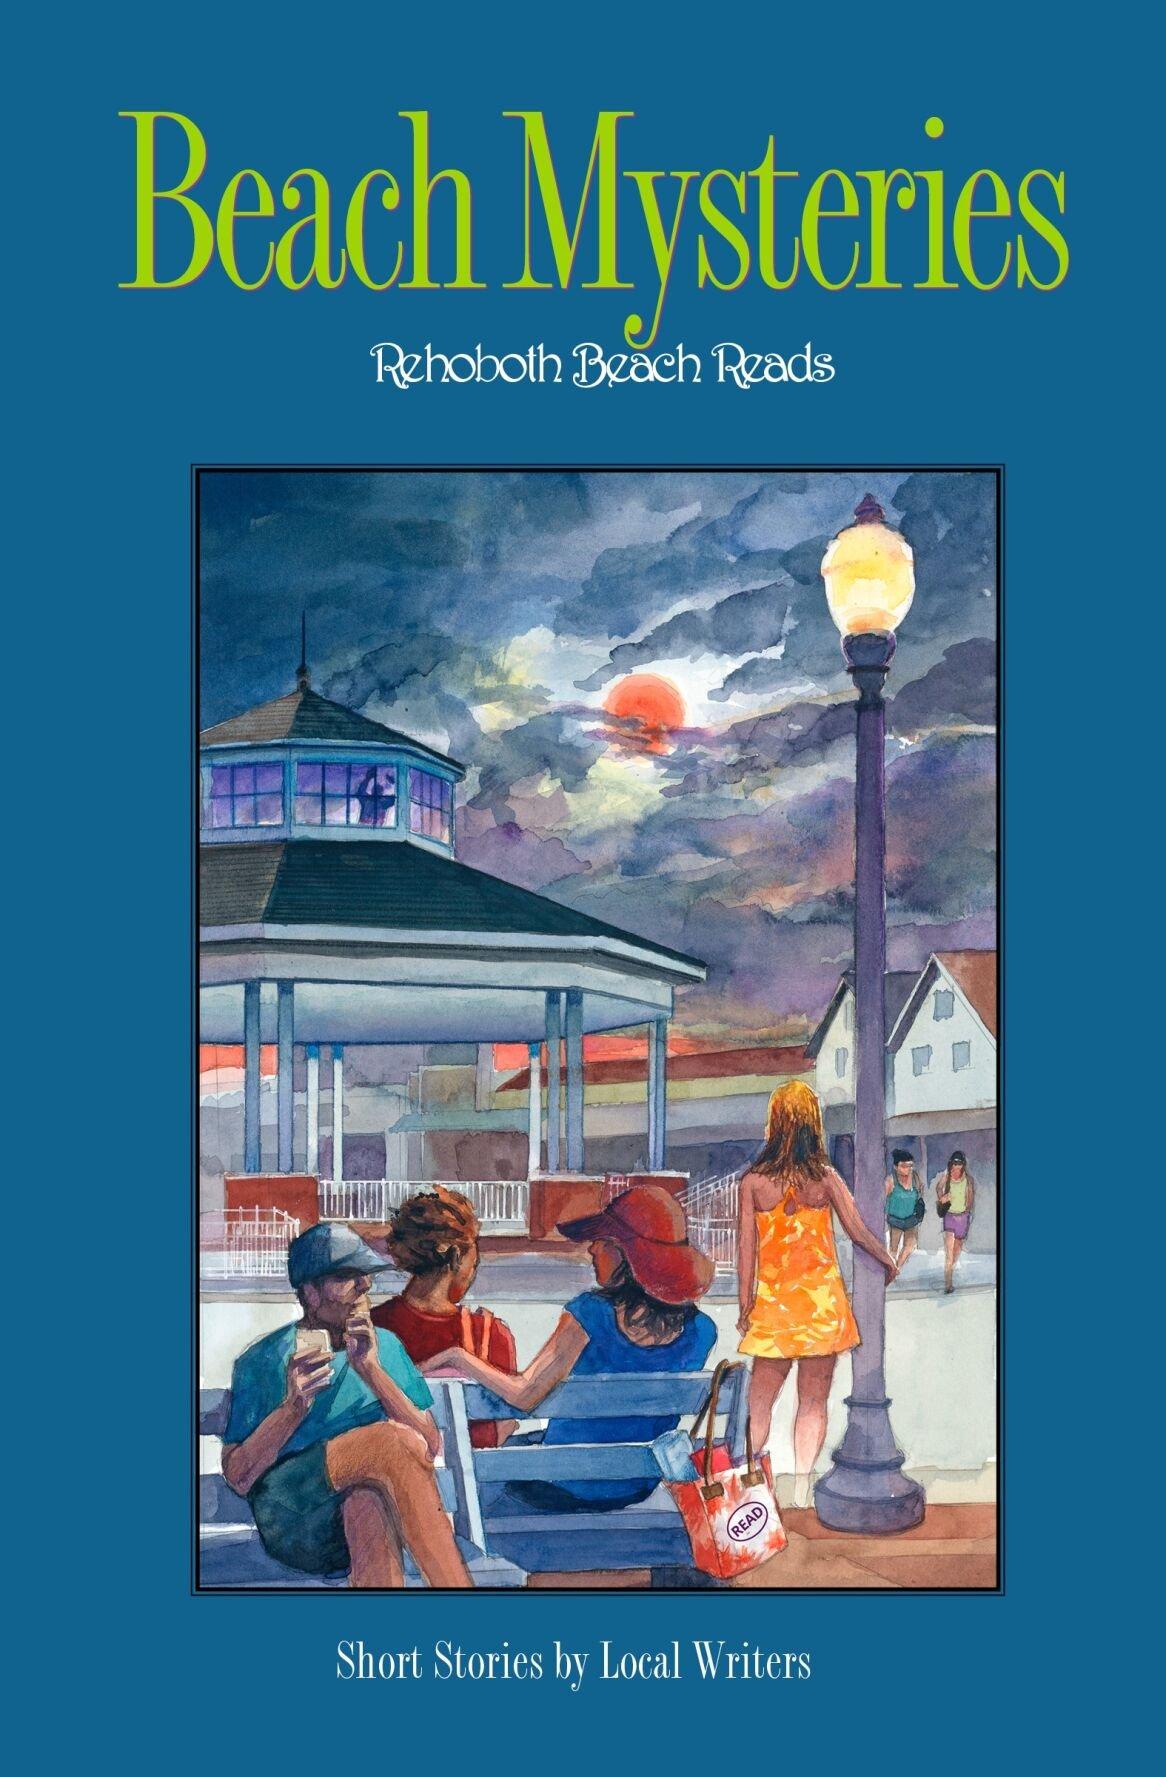 Beach Mysteries cover.jpg